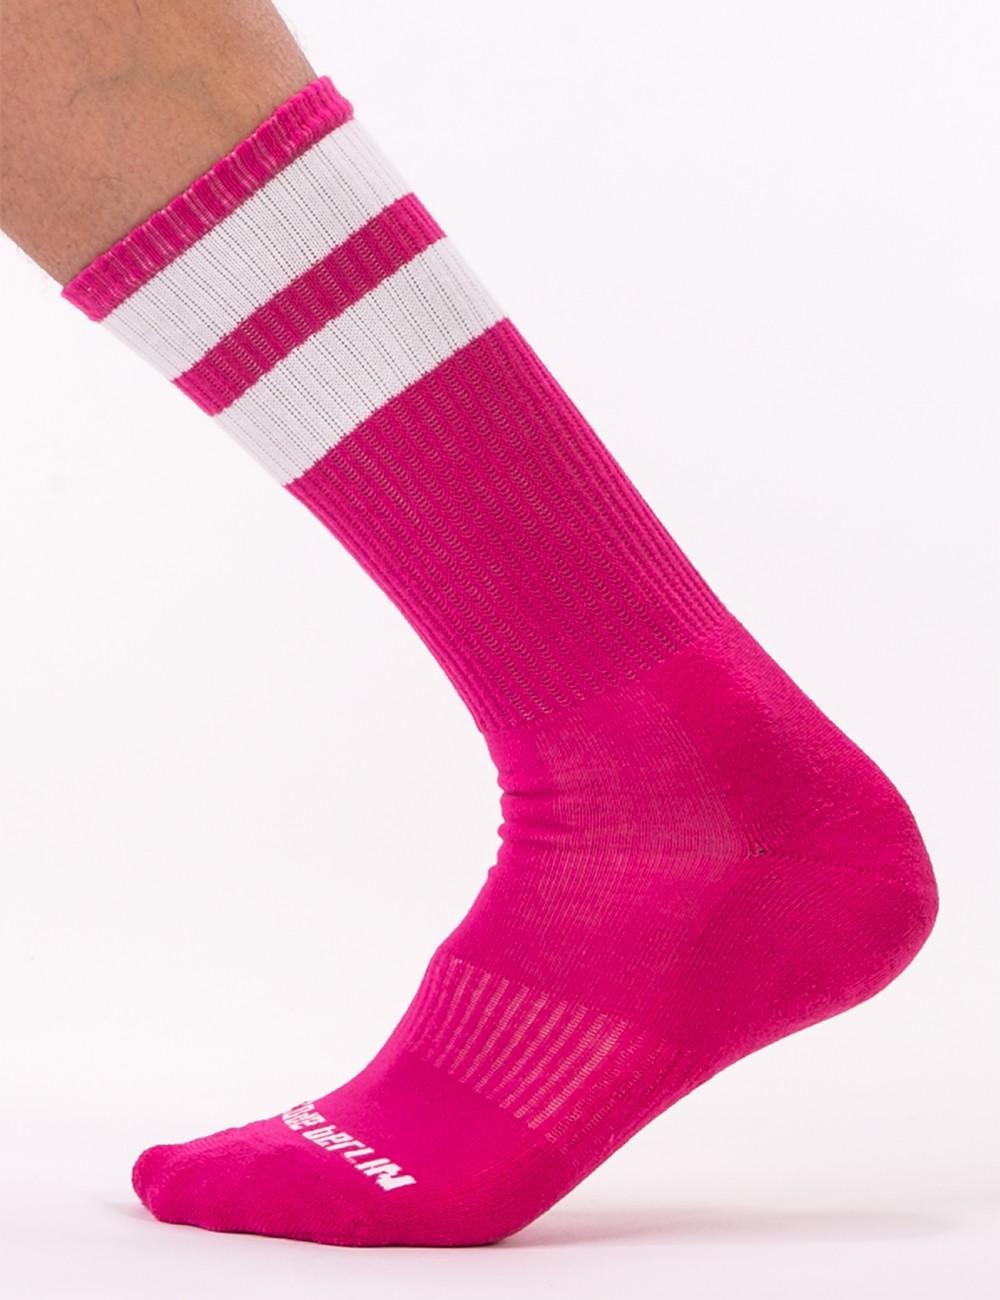 Gym Socks - Pink-White